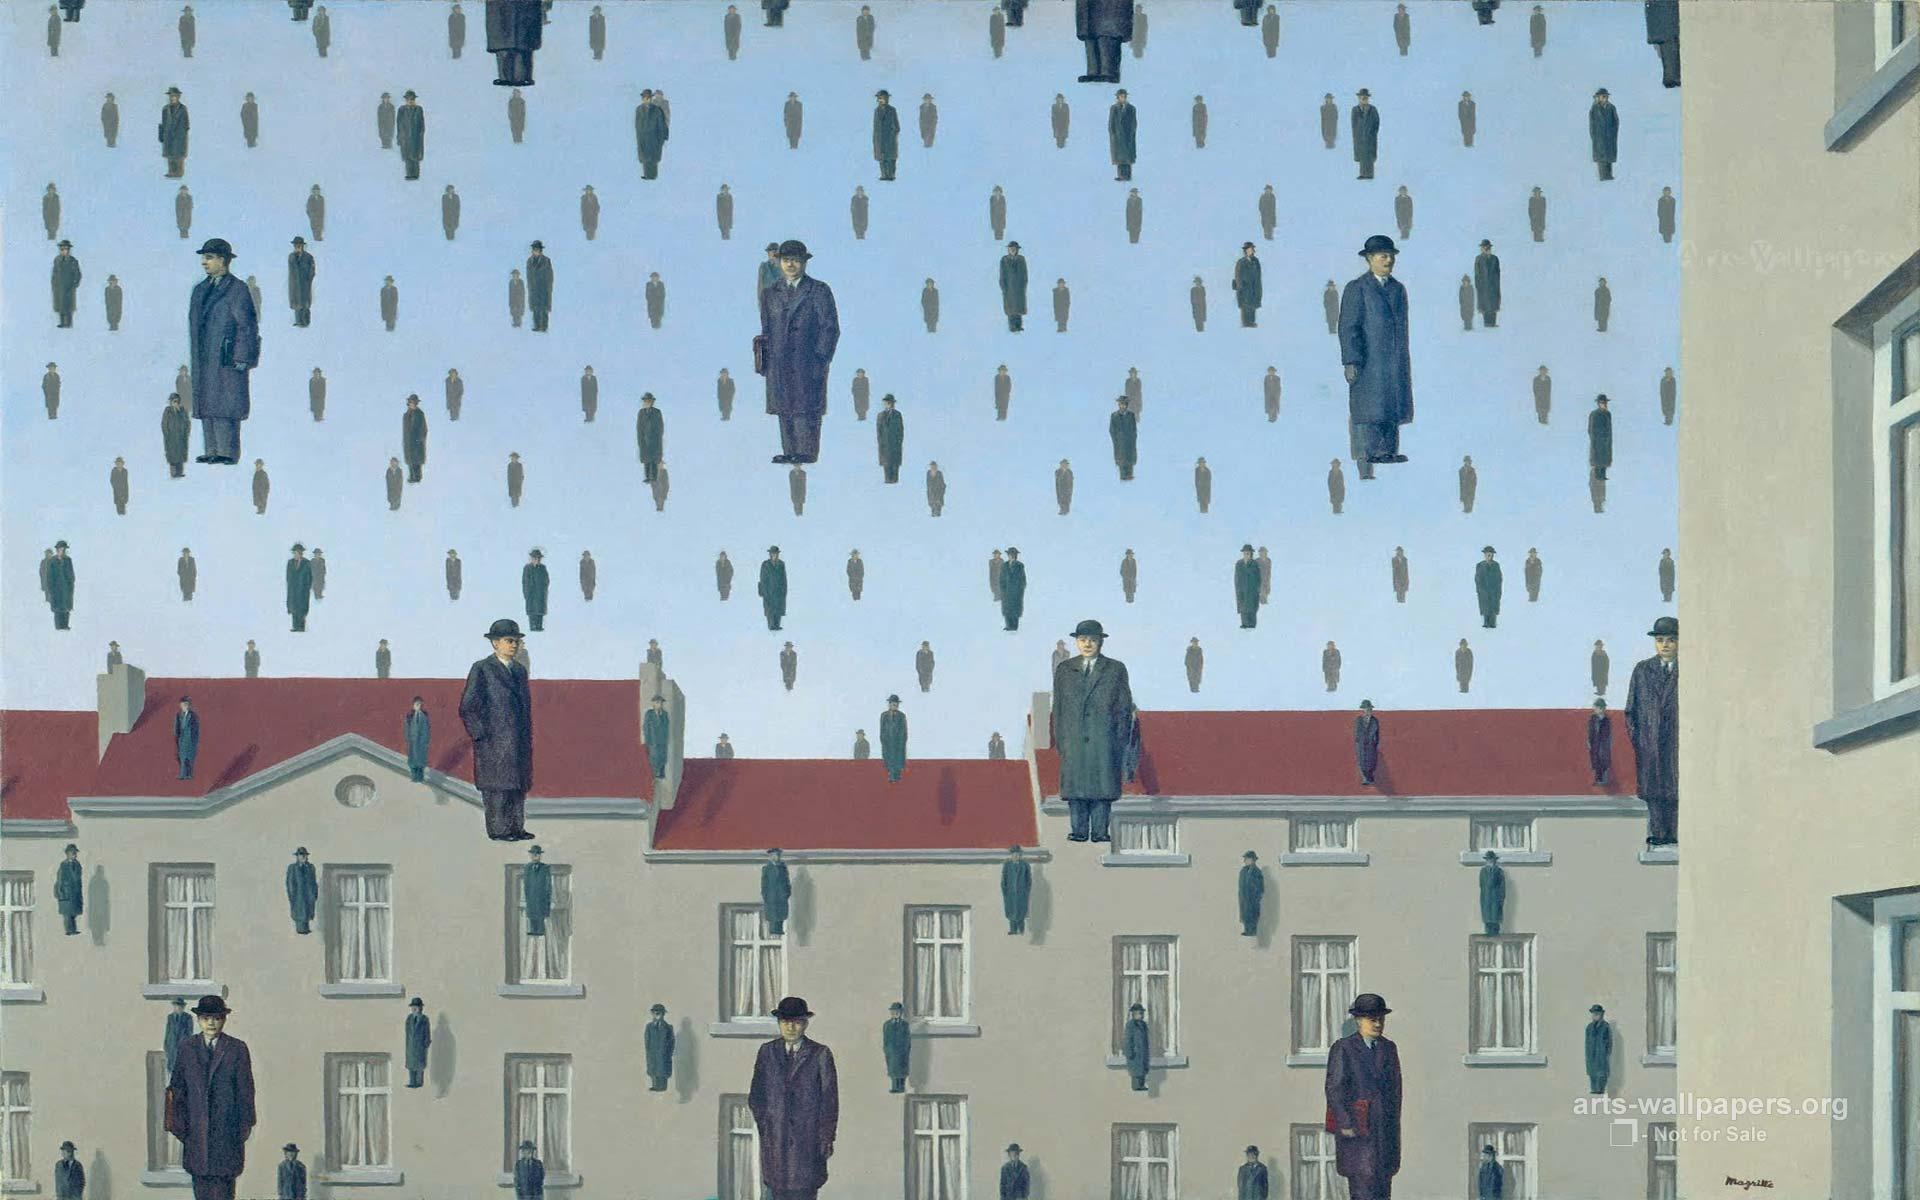 Rene Magritte Wallpaper 01 1920x1200